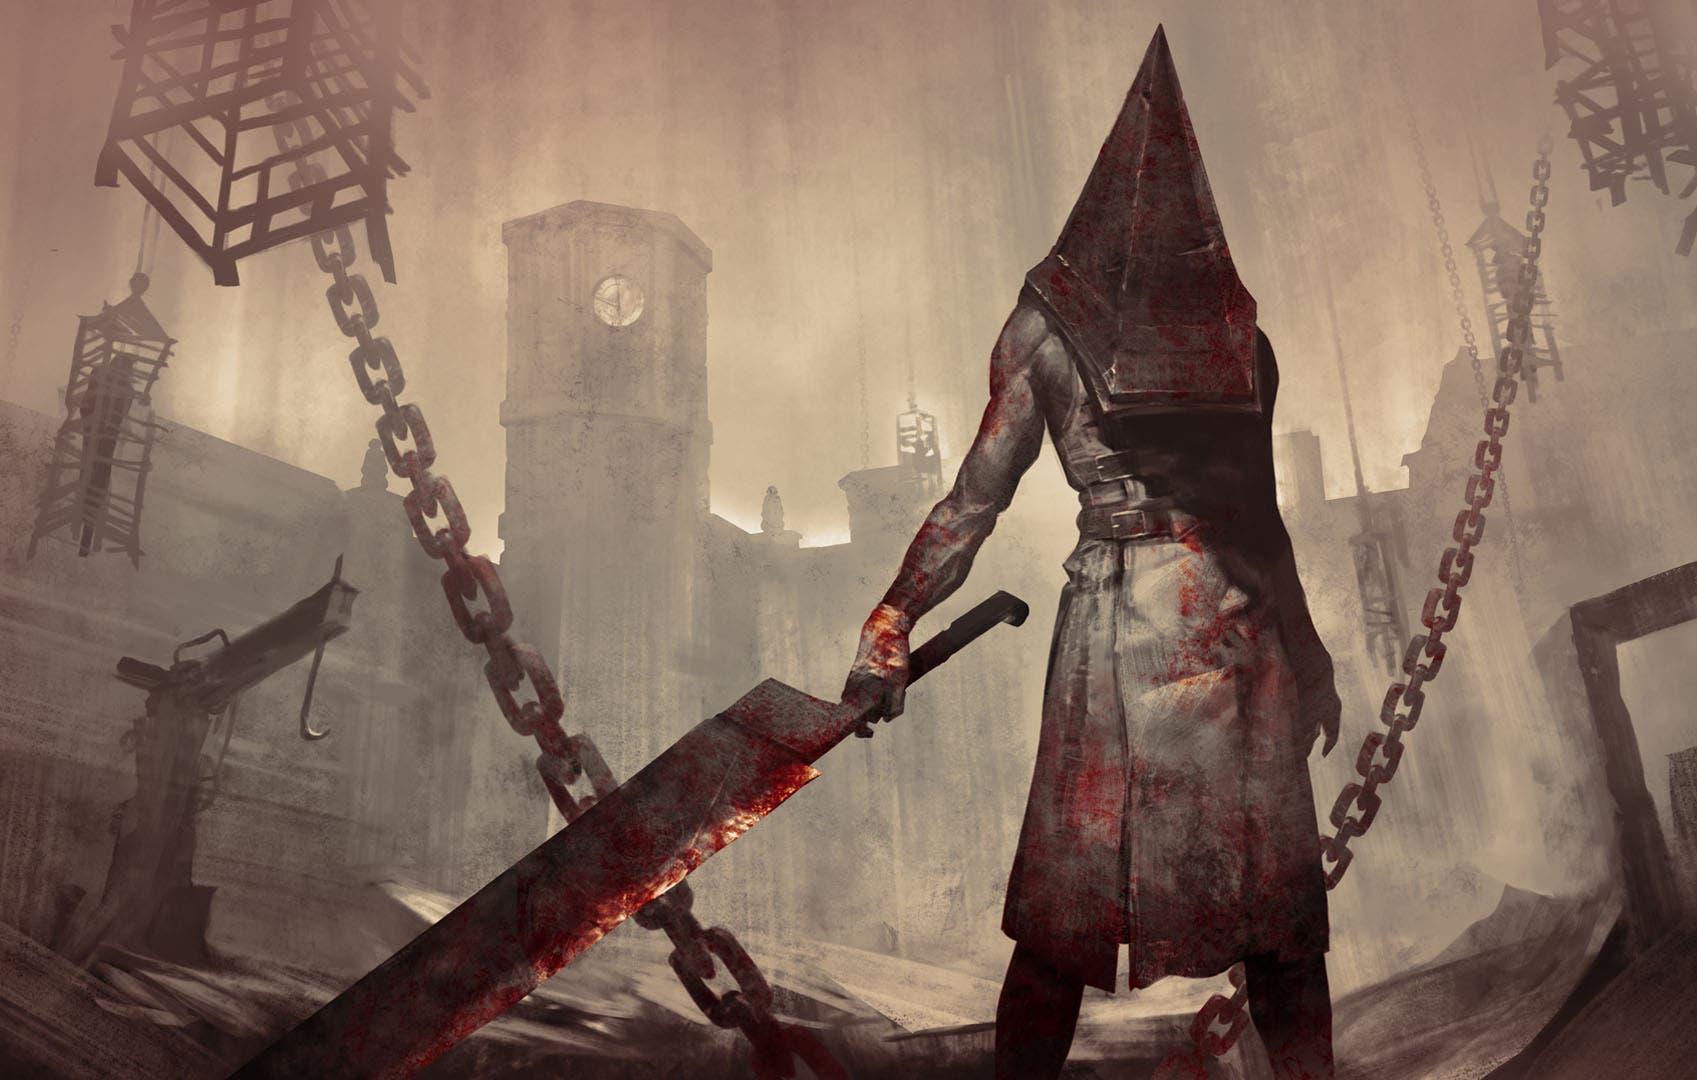 Así se fraguó el DLC de Silent Hill para Dead by Daylight 3